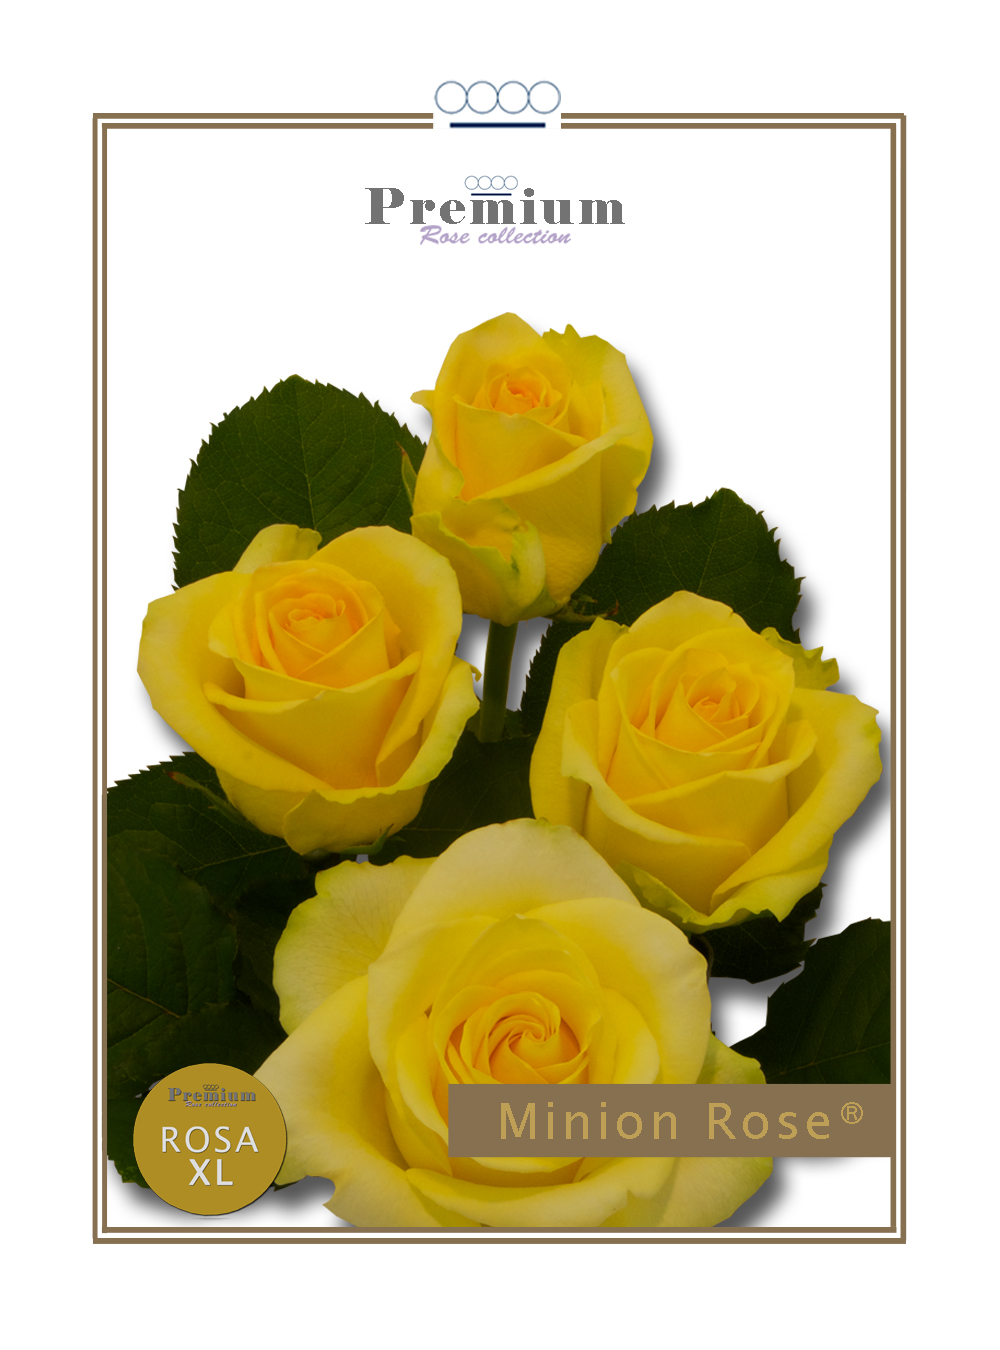 Minion Rose®